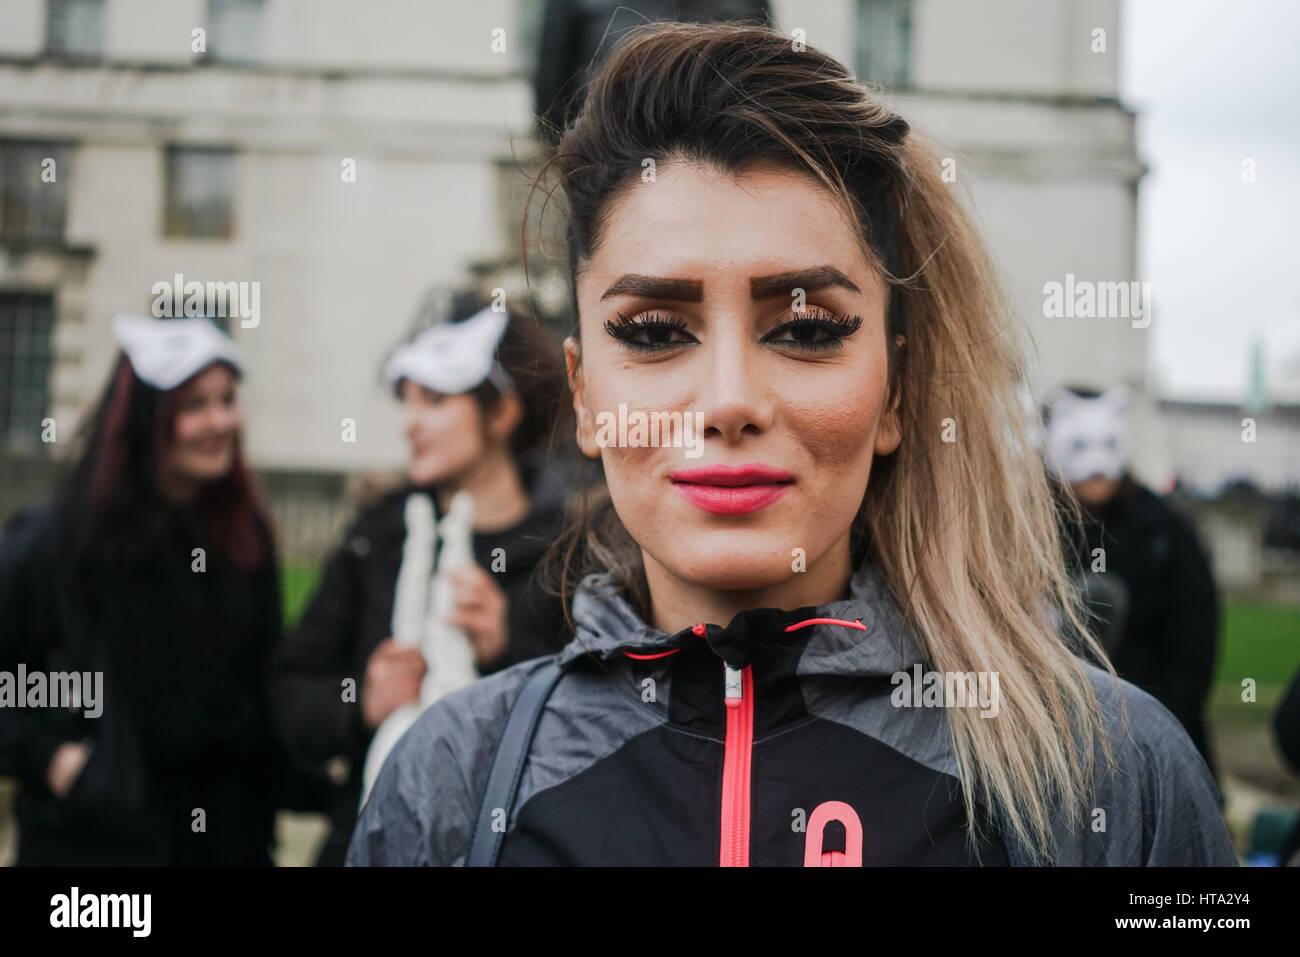 Iransk UK dating